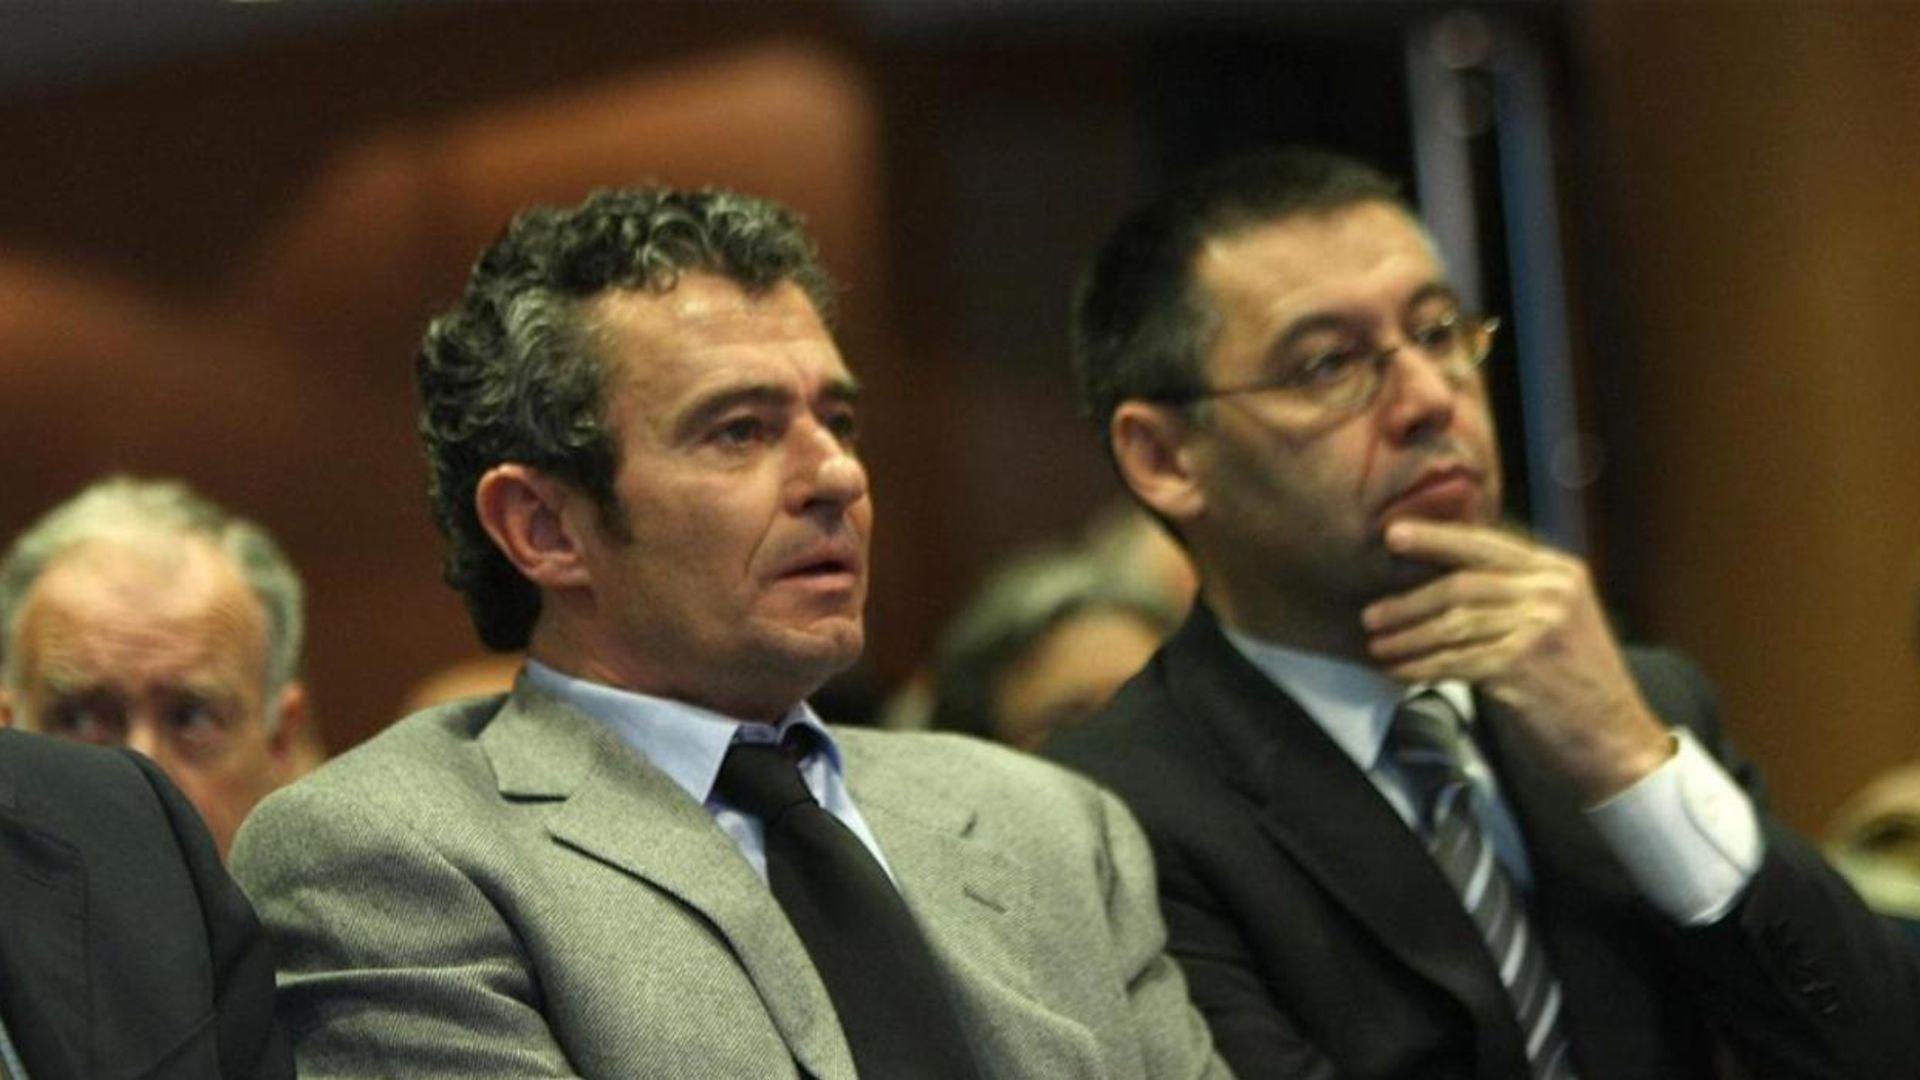 Bartomeu Jaume Masferrer